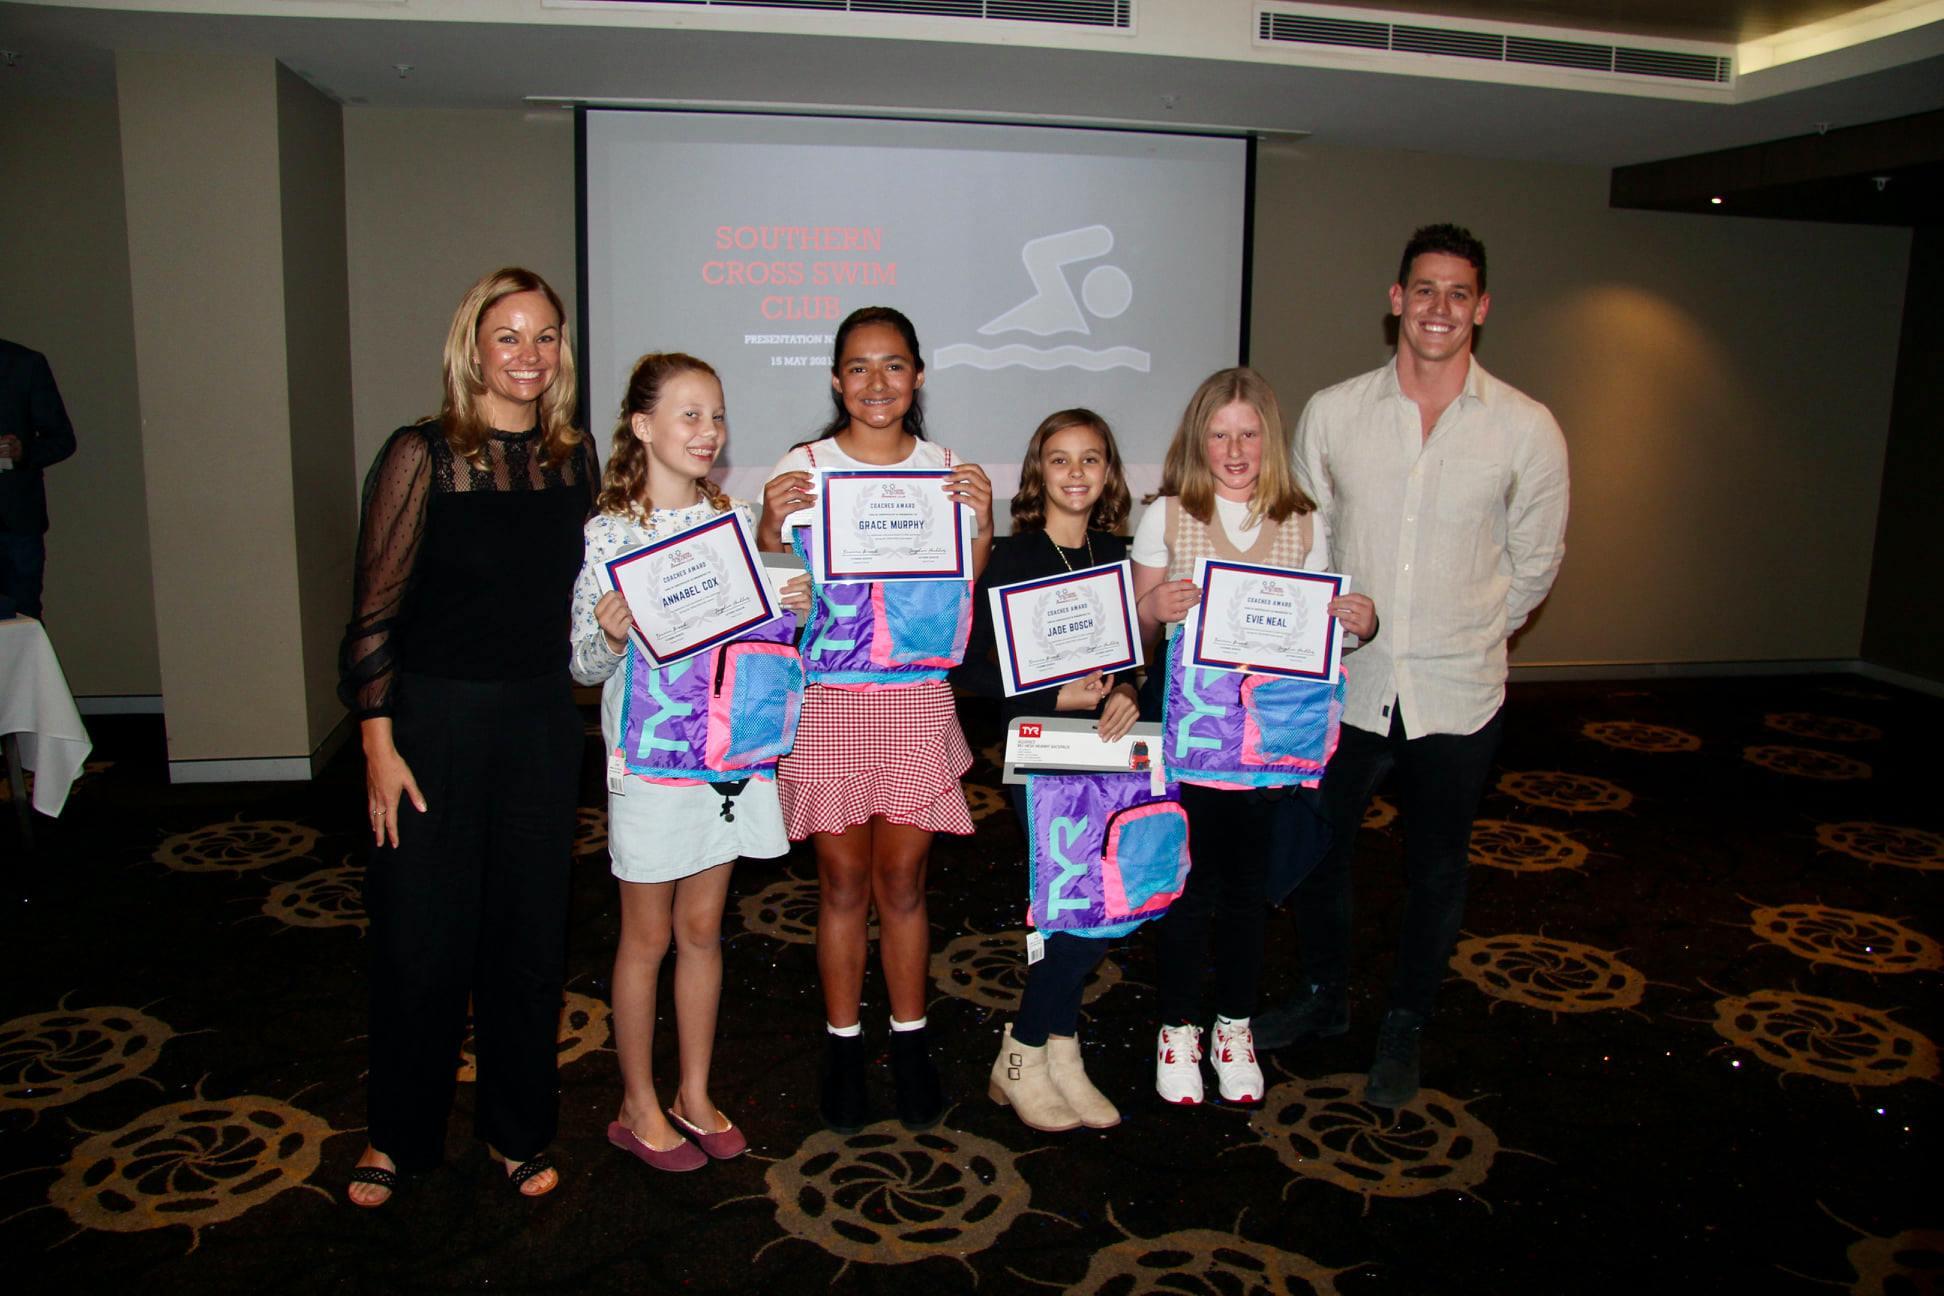 Southern Cross swimming Club Presentation Night 2021 Champions